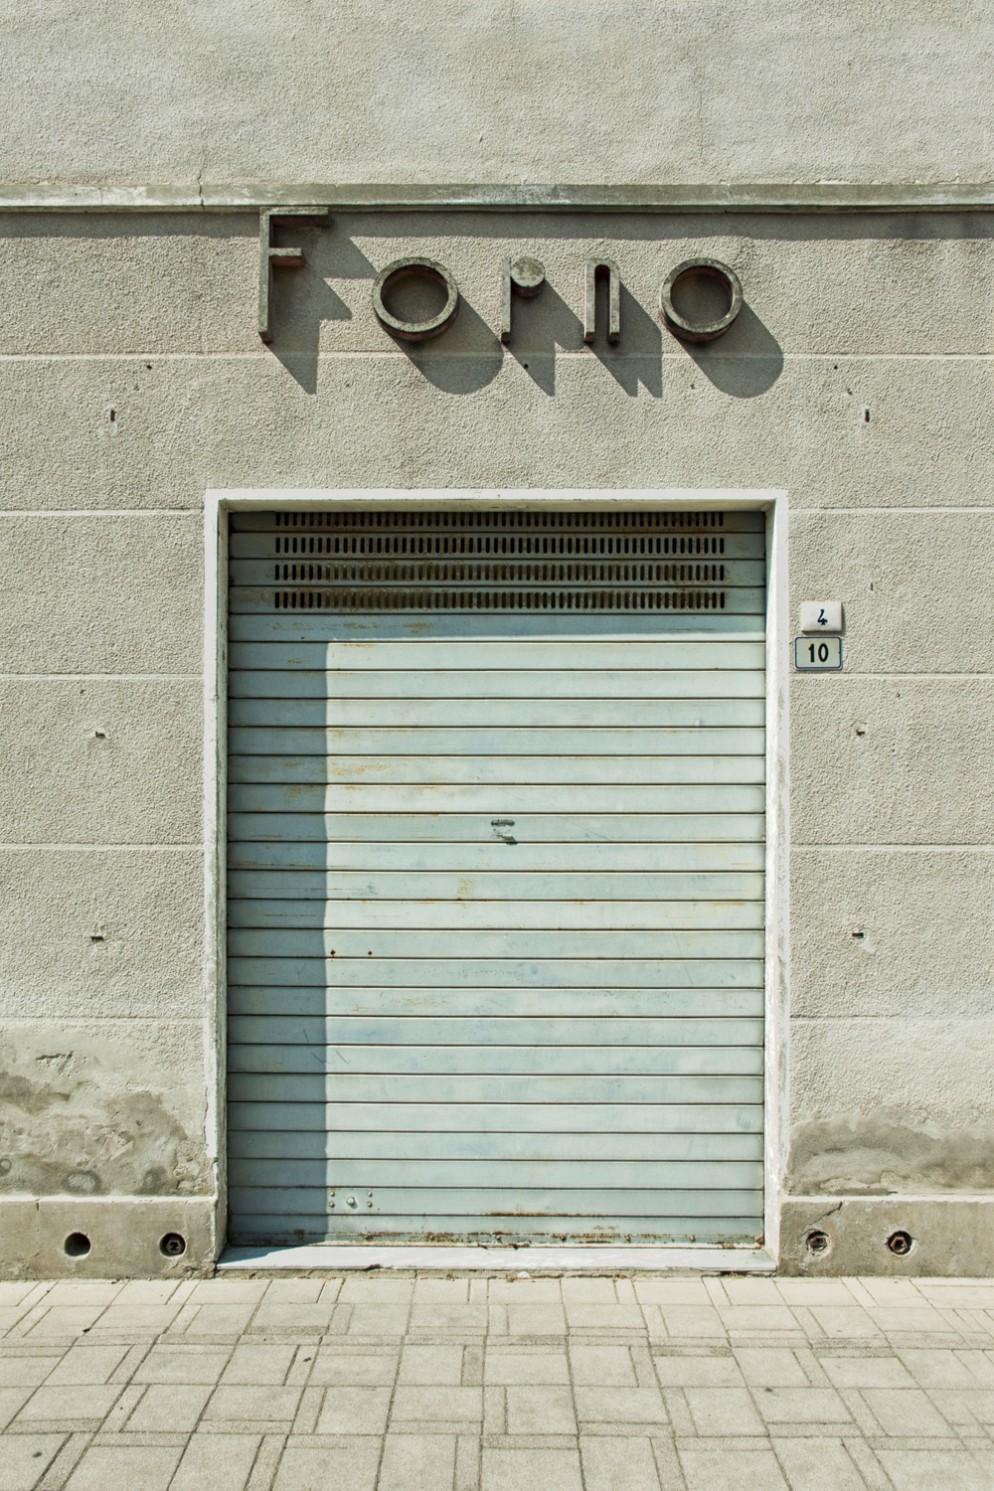 tresigallo-ferrara-009_Lorenzo Linthout11living-corriere